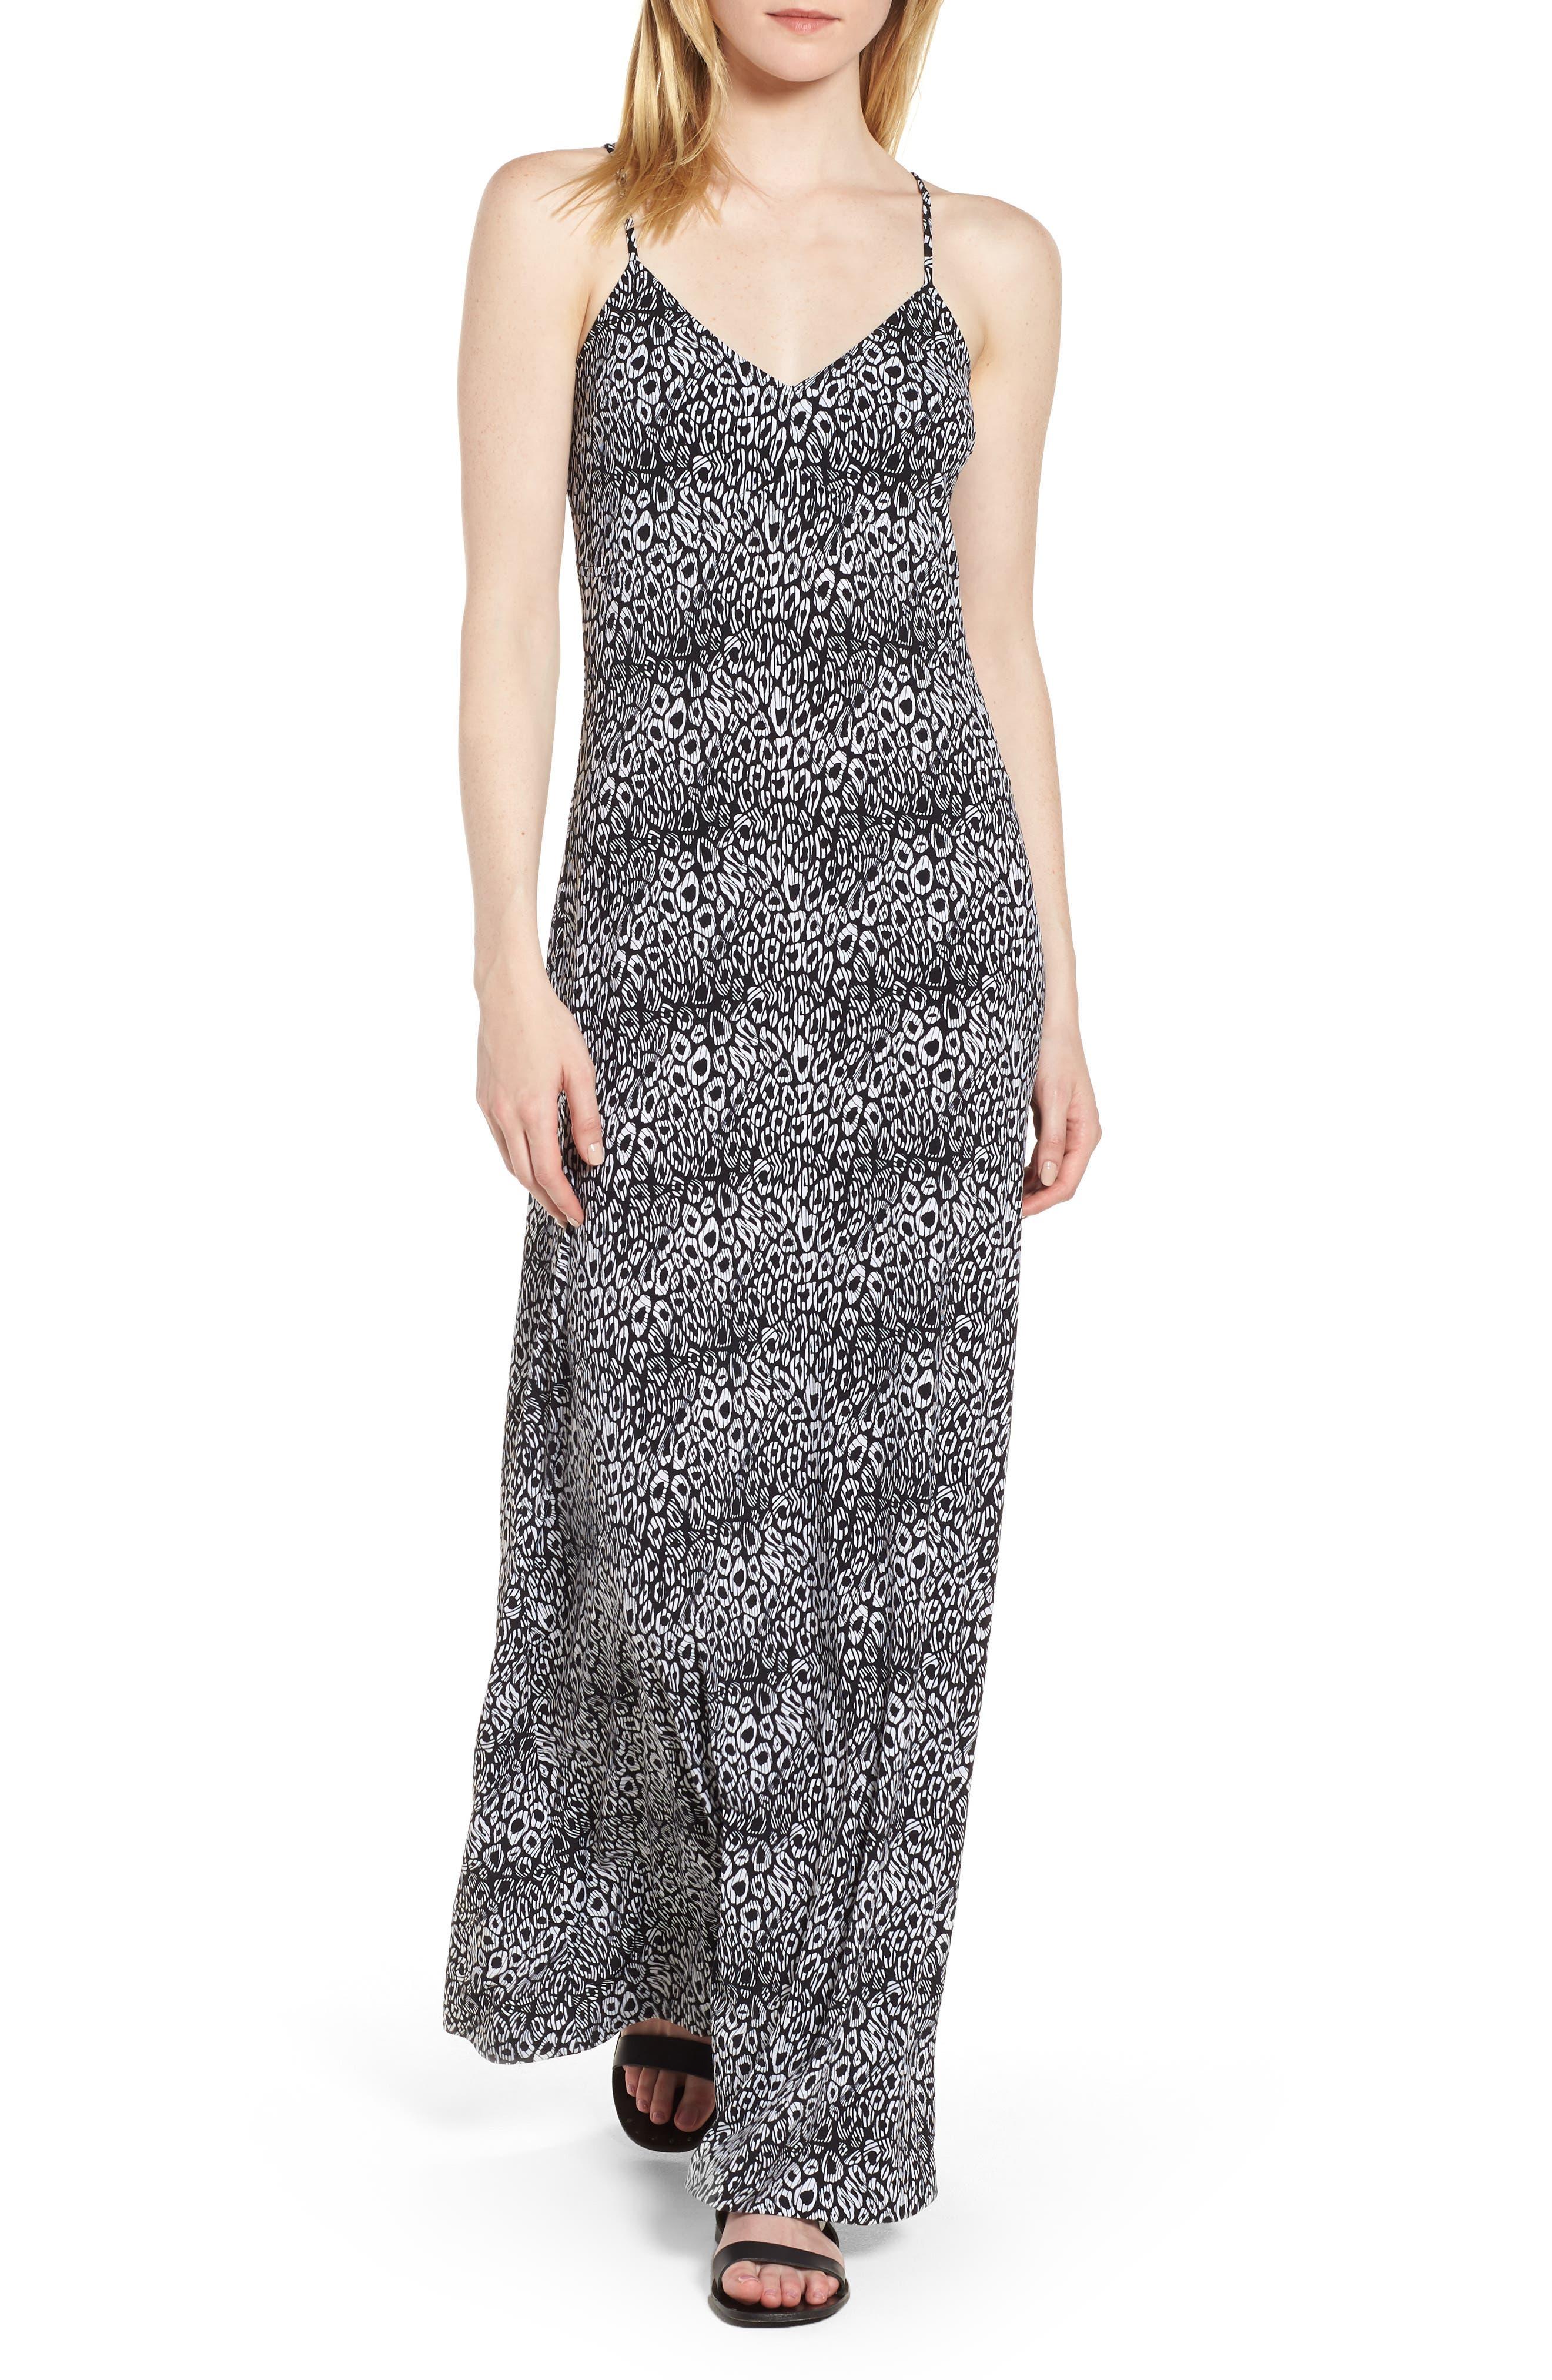 Wavy Leopard Print Tank Maxi Dress,                         Main,                         color, Black/ White